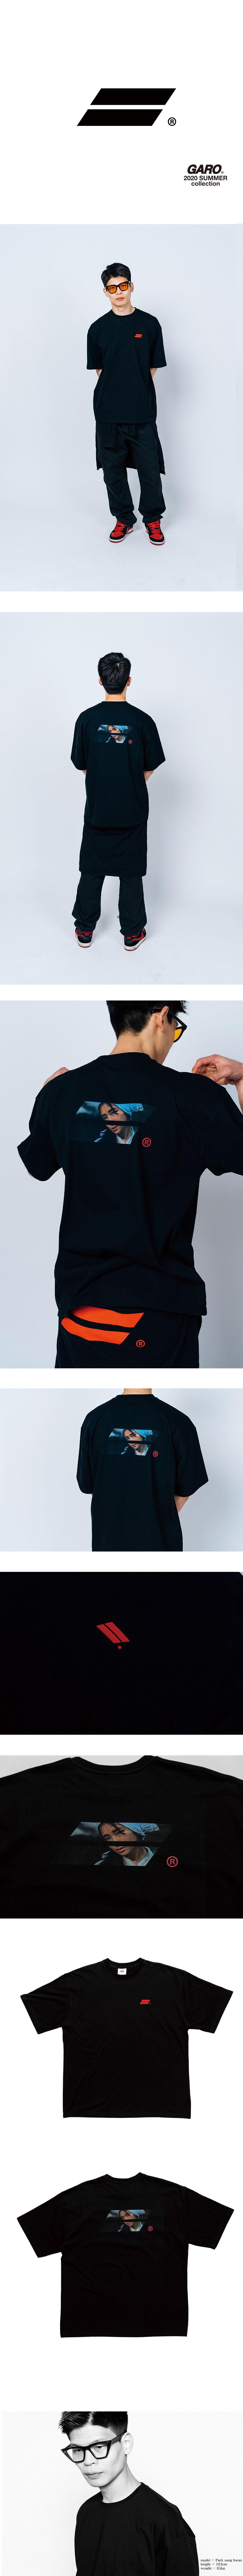 2020ss상세페이지(뻐꾸기-티셔츠).jpg